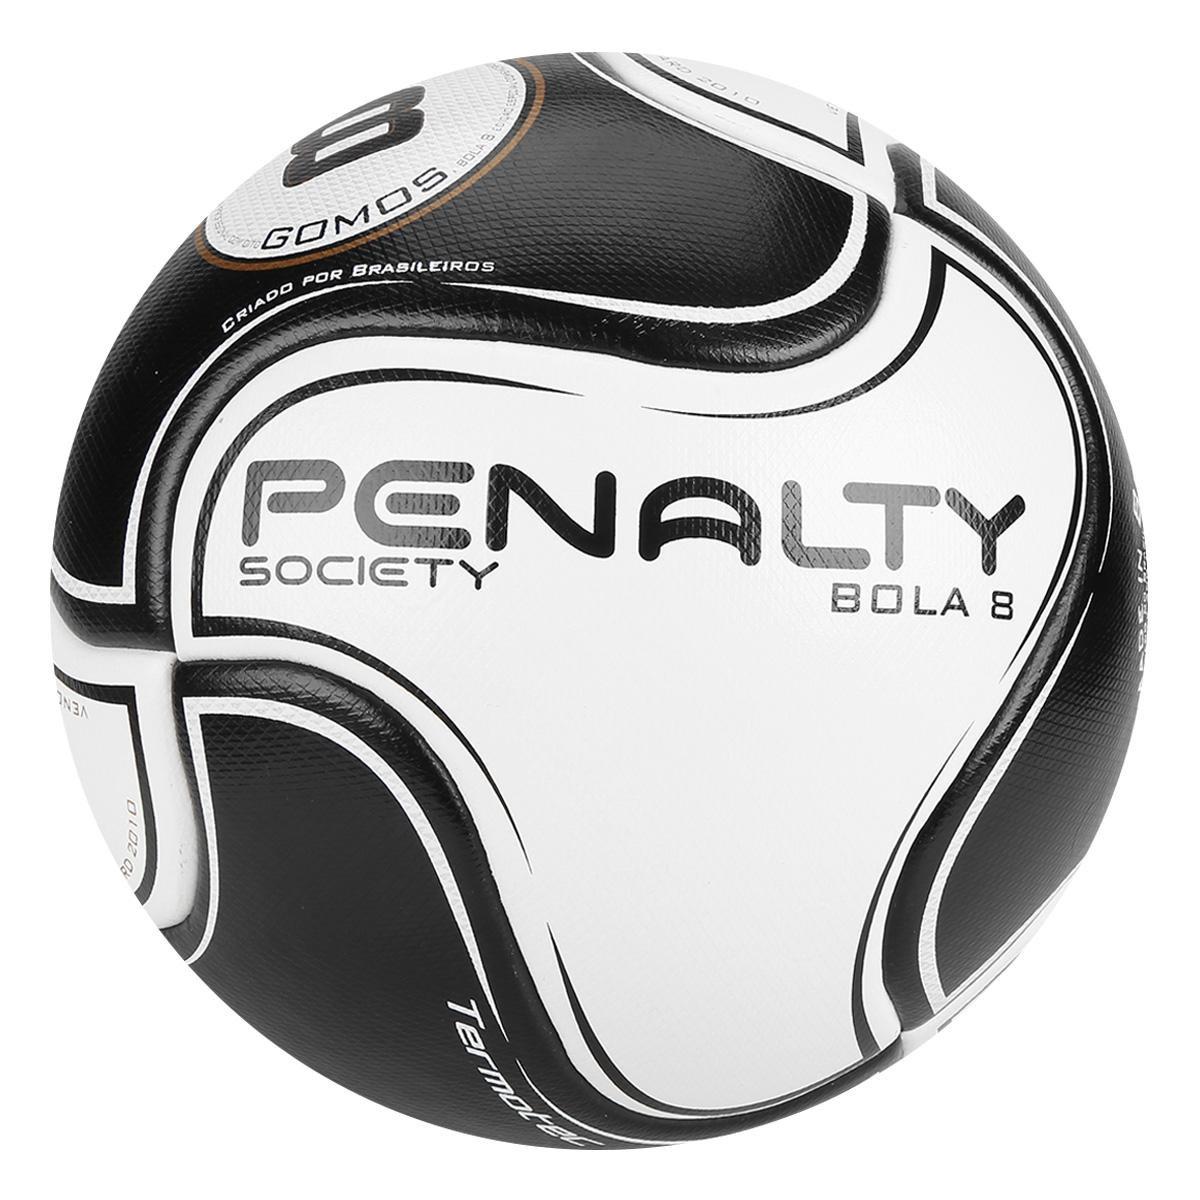 Bola Futebol Society Penalty 8 VIII - Branco e Preto - Compre Agora ... 36bc748d4167b